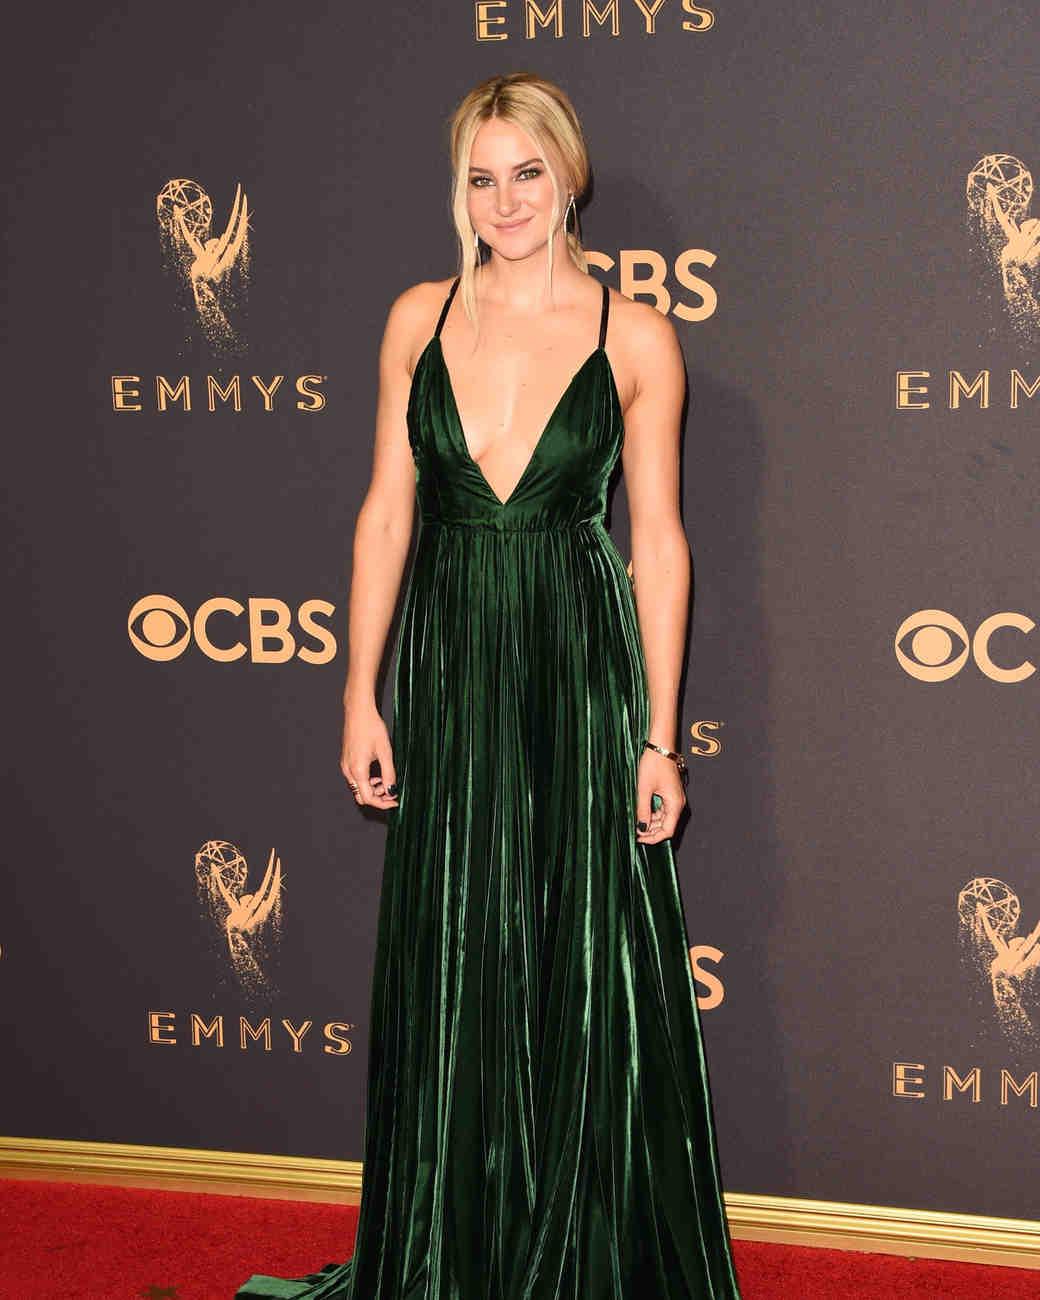 Shailene Woodley Emmys Red Carpet 2017